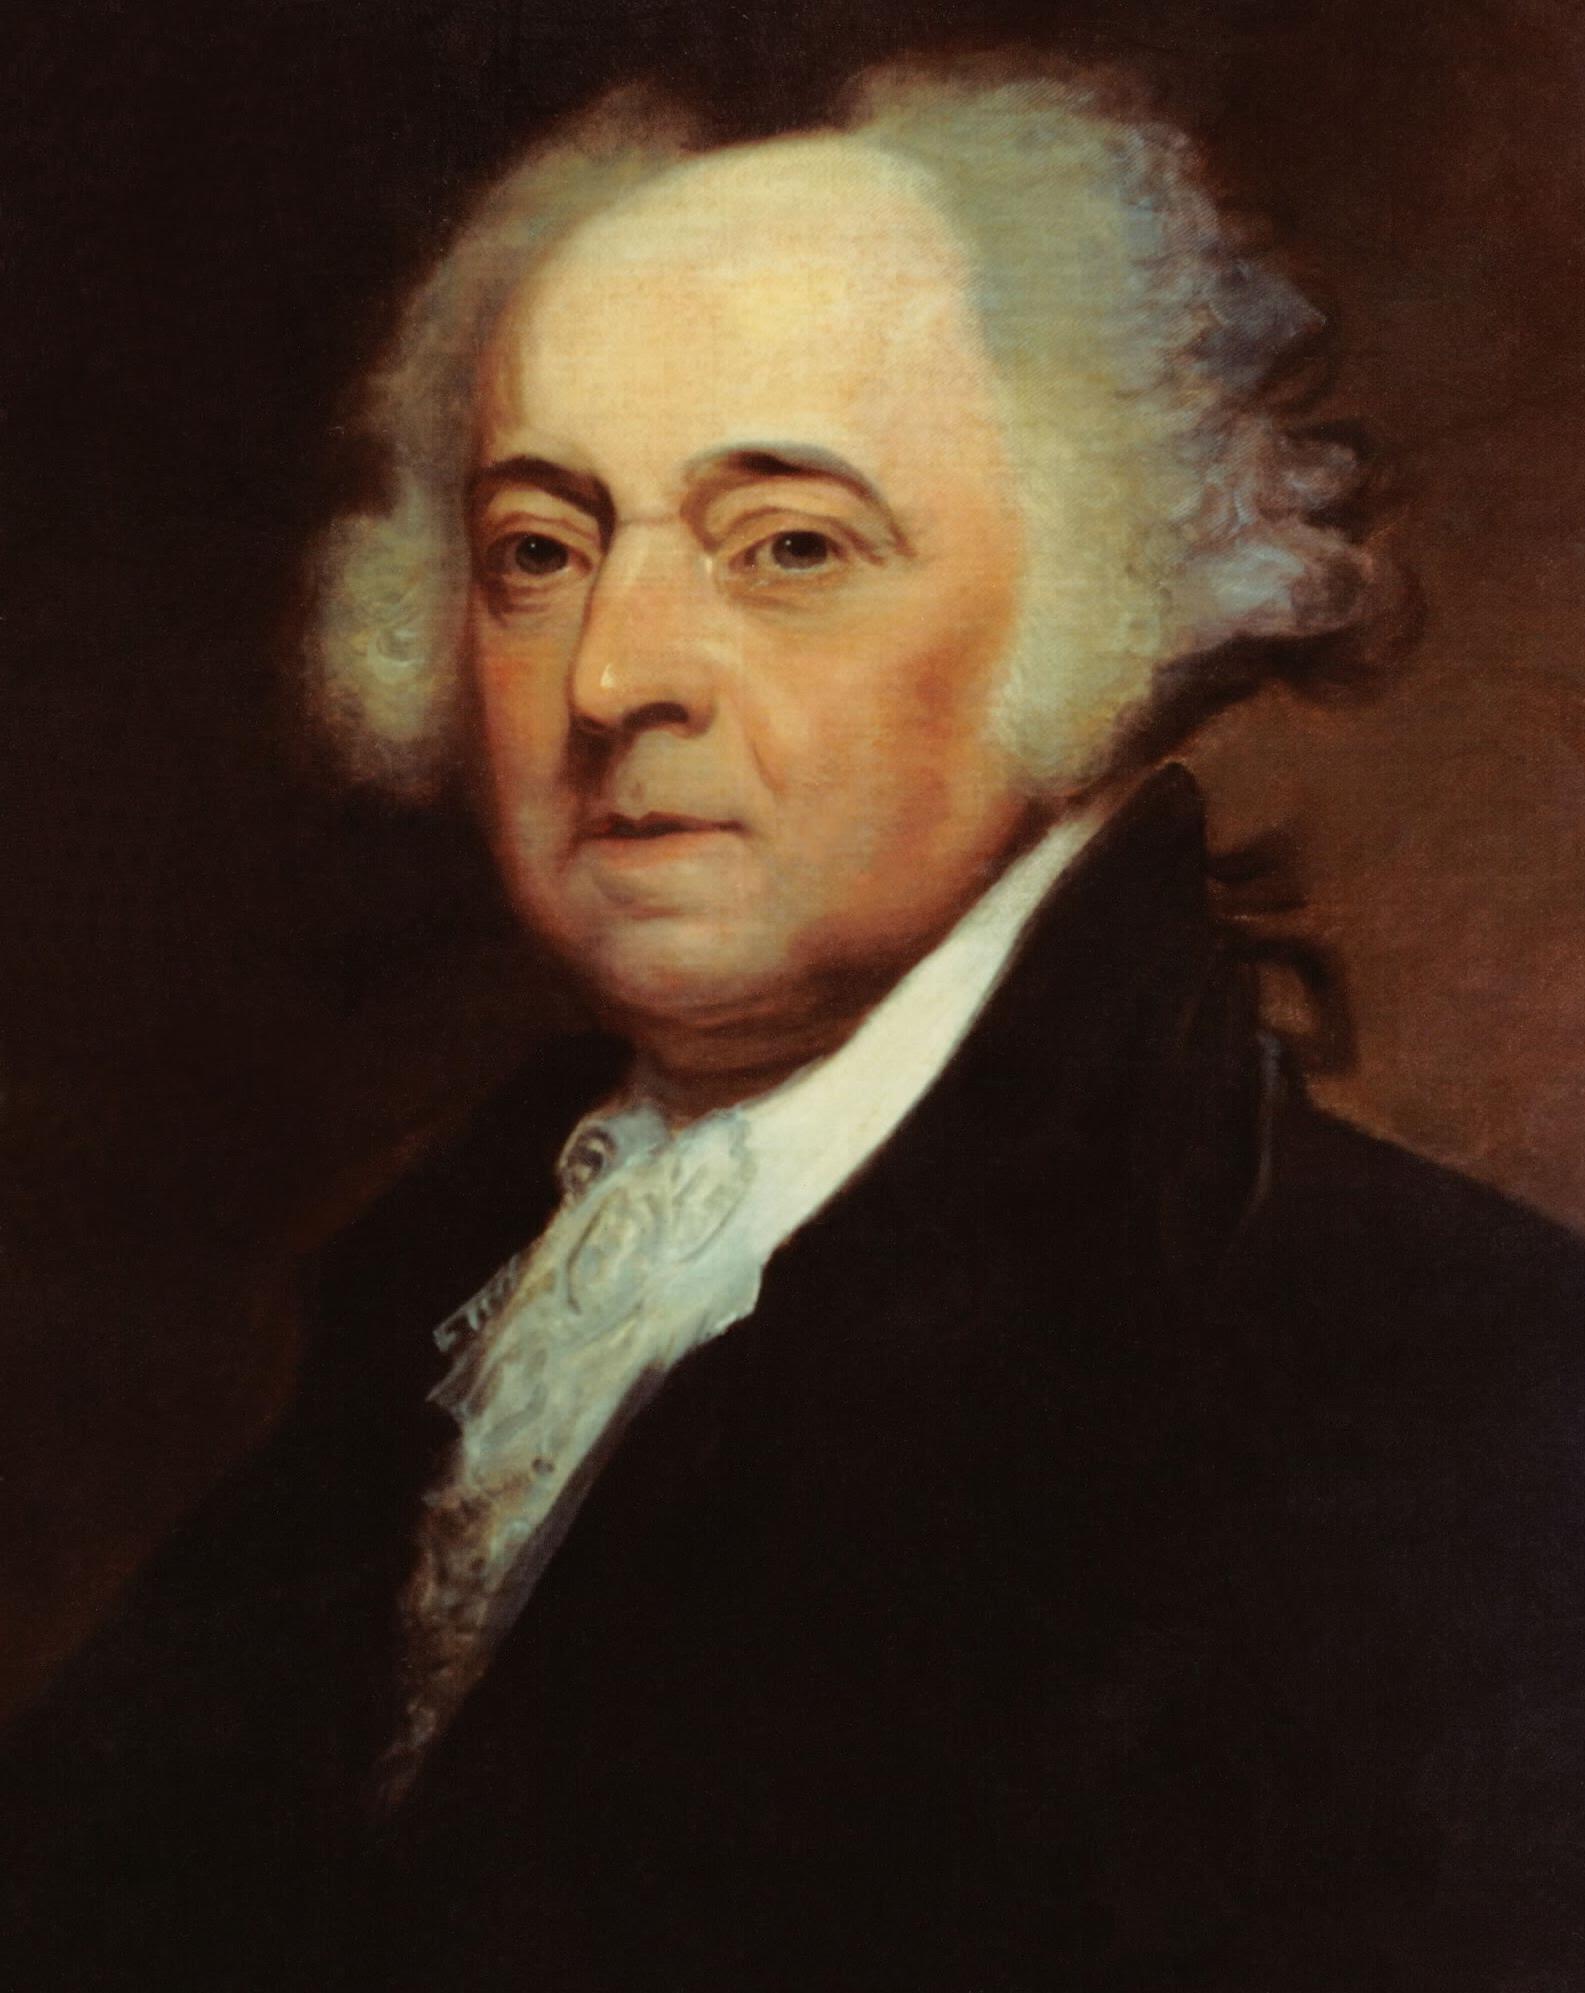 Asher Brown Durand: John Adams